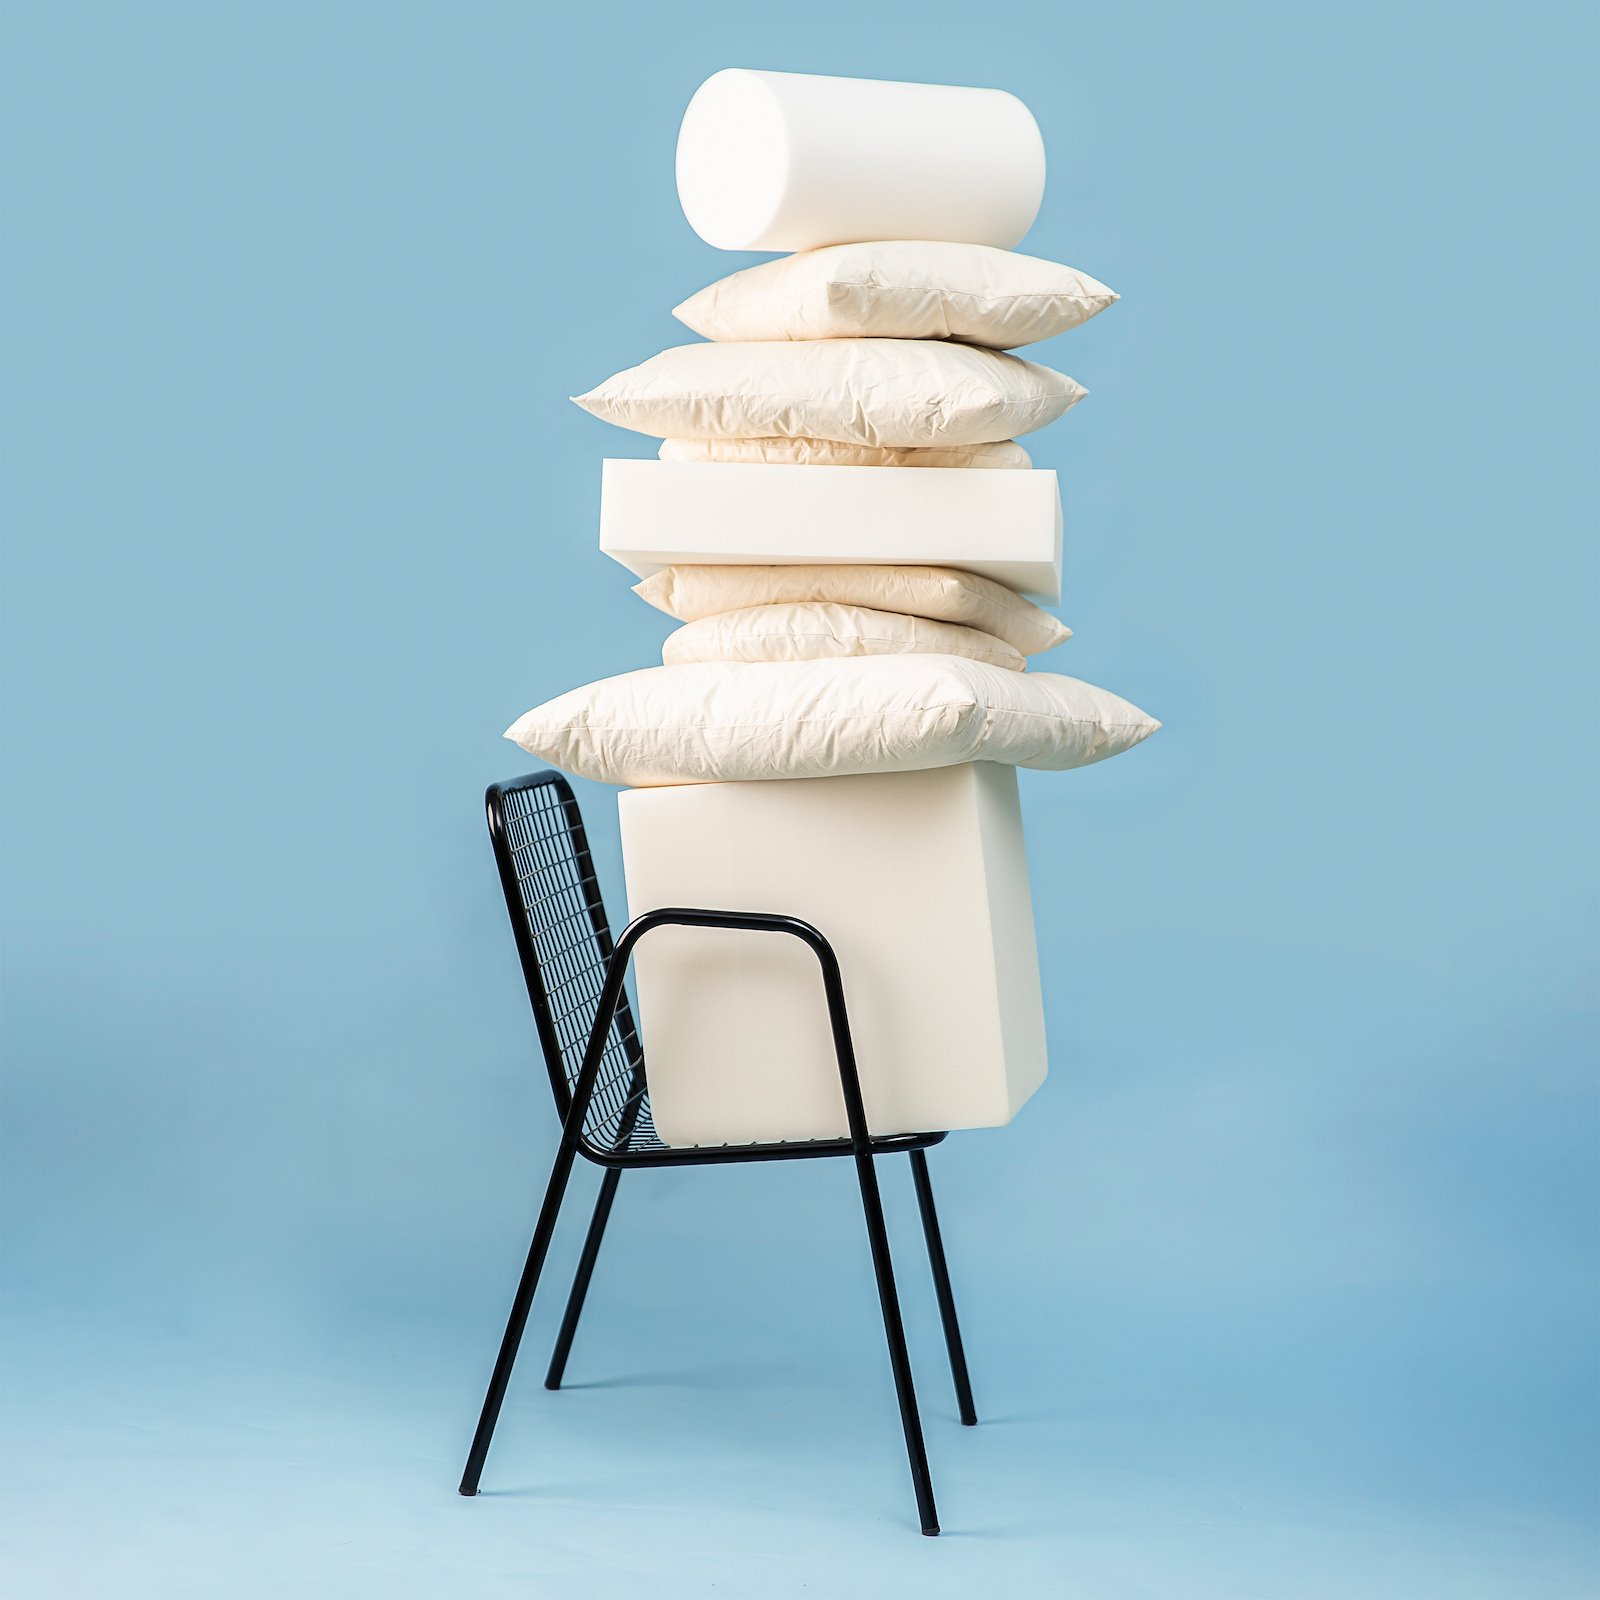 Cushion w/nature filling Ø45cm creme 38080061_38080002_38098050_38070048_38070045_38070061_38070050_38070060_bundle